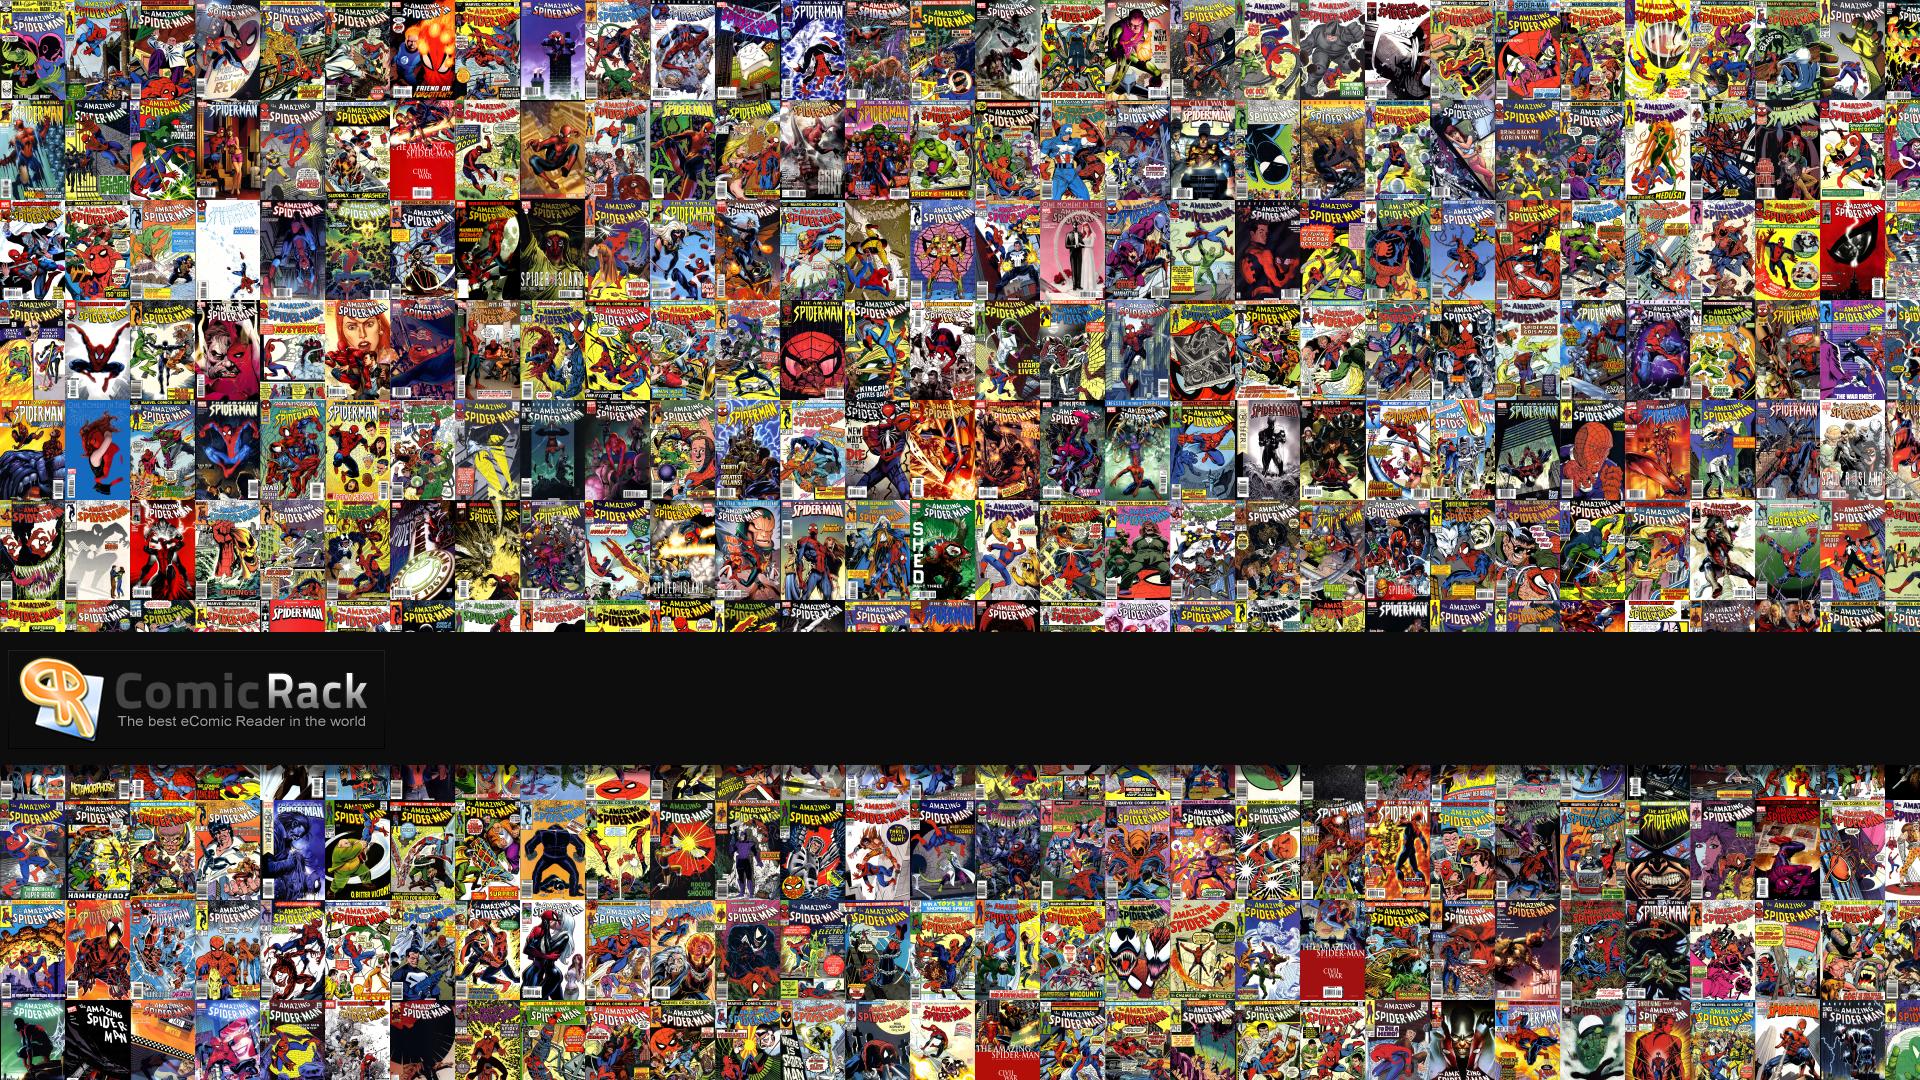 Comics Spider man Wallpaper 1920x1080 Comics Spiderman Books Marvel 1920x1080